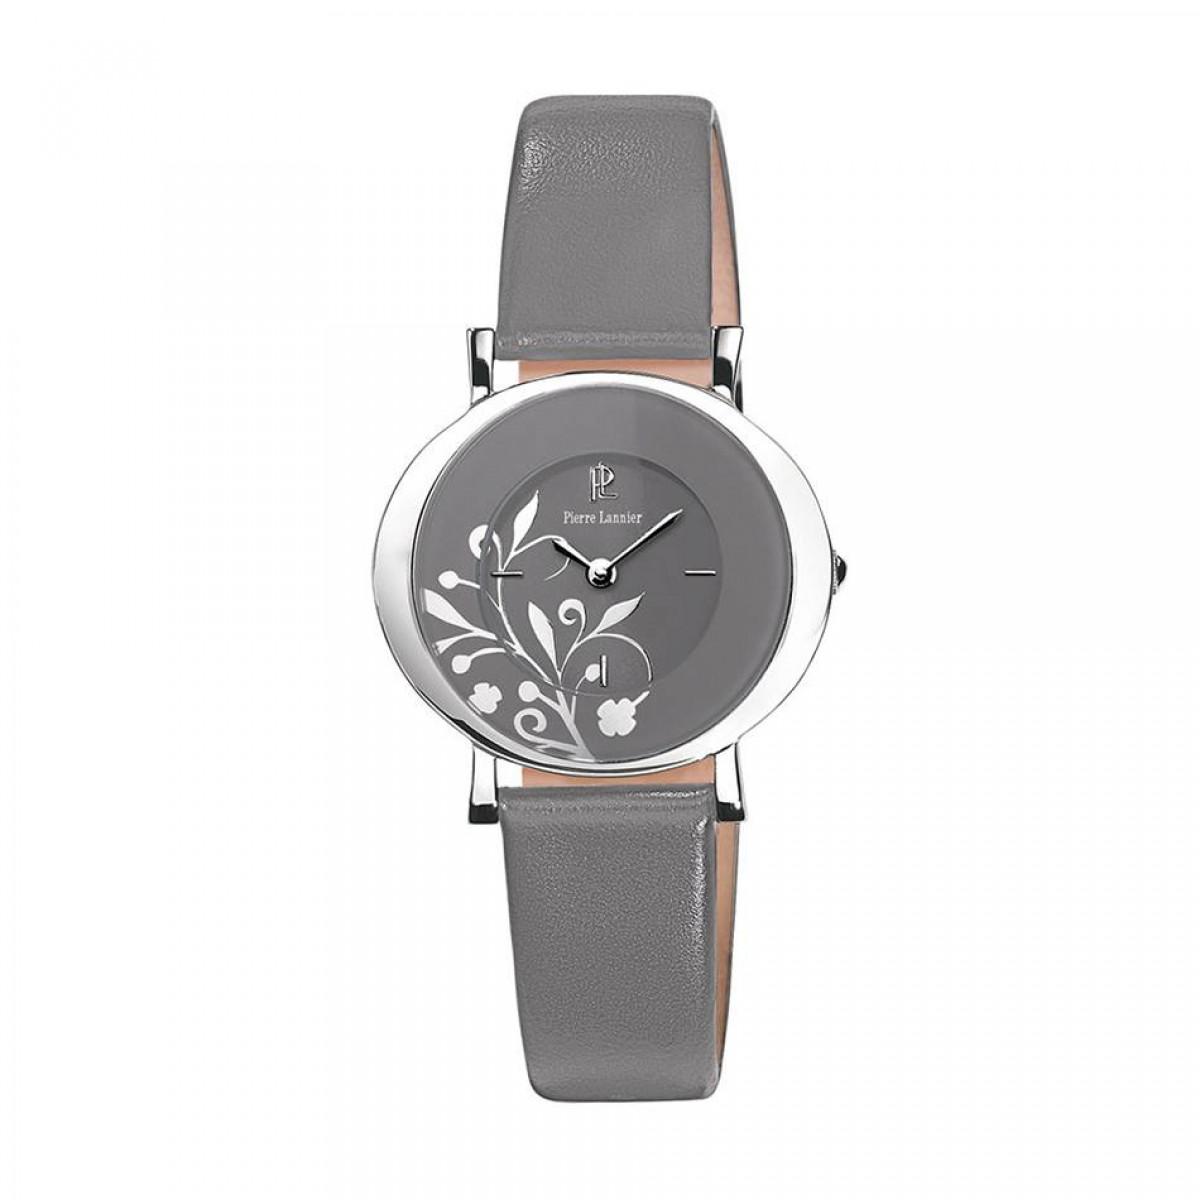 Часовник Pierre Lannier 031K688